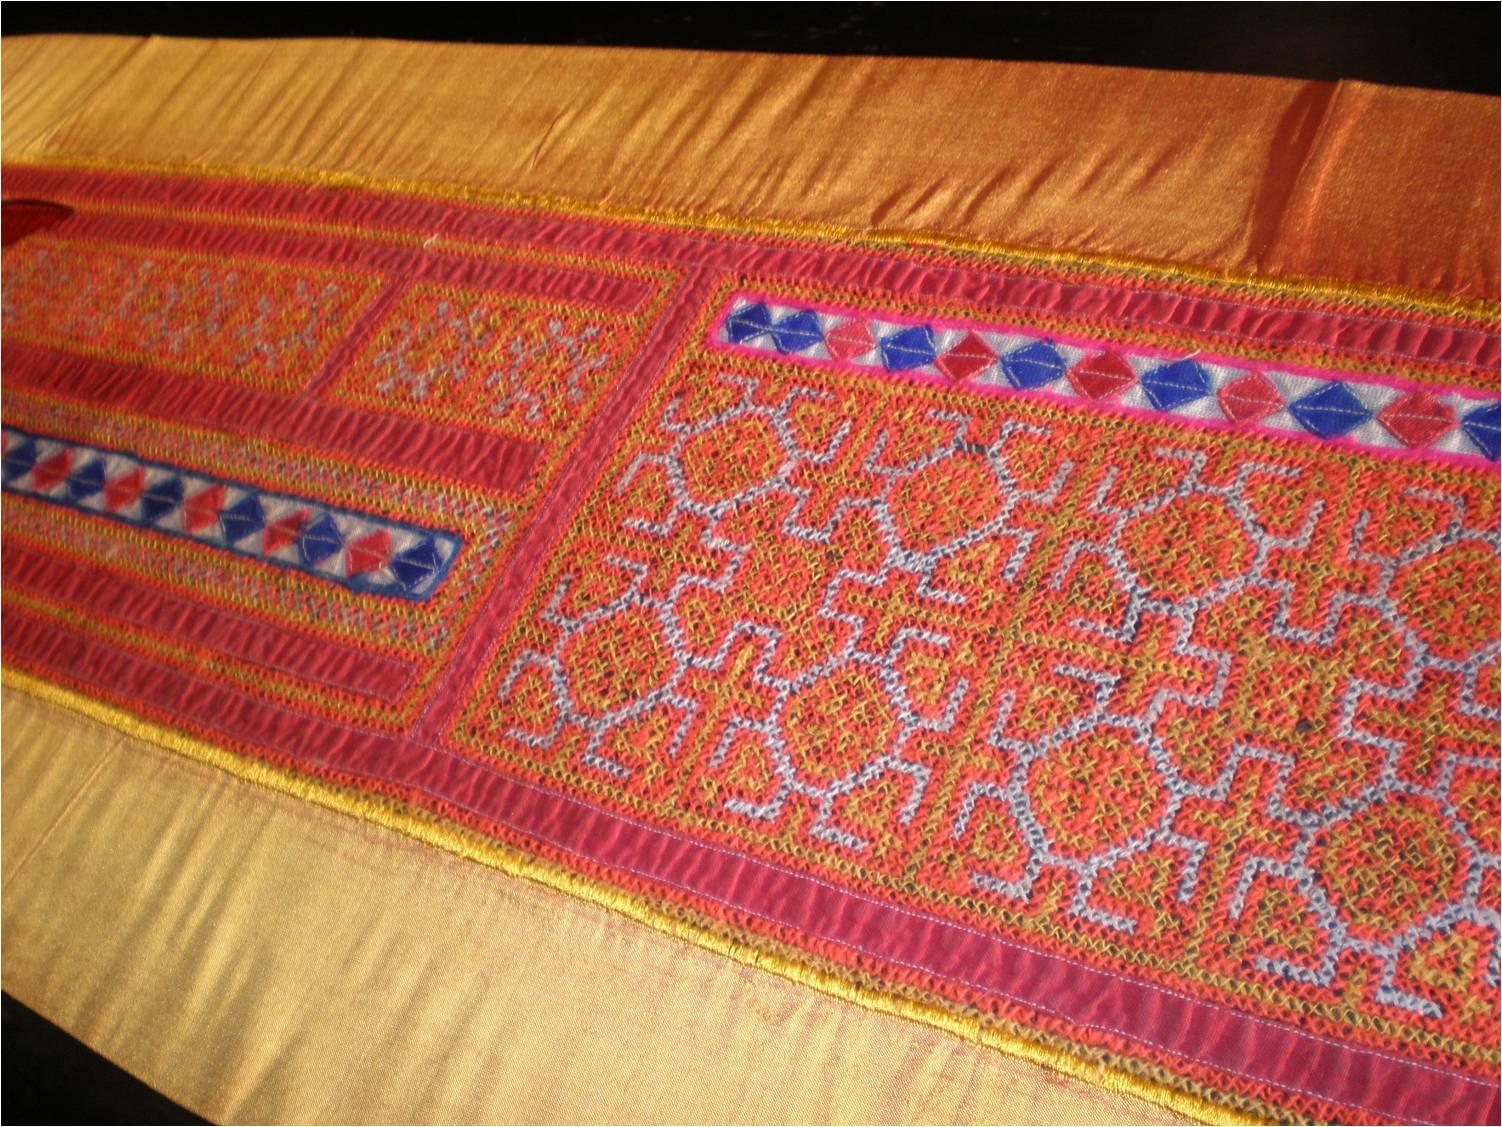 hmong textiles essay More than a pretty cloth: teaching hmong history and culture through textile art.